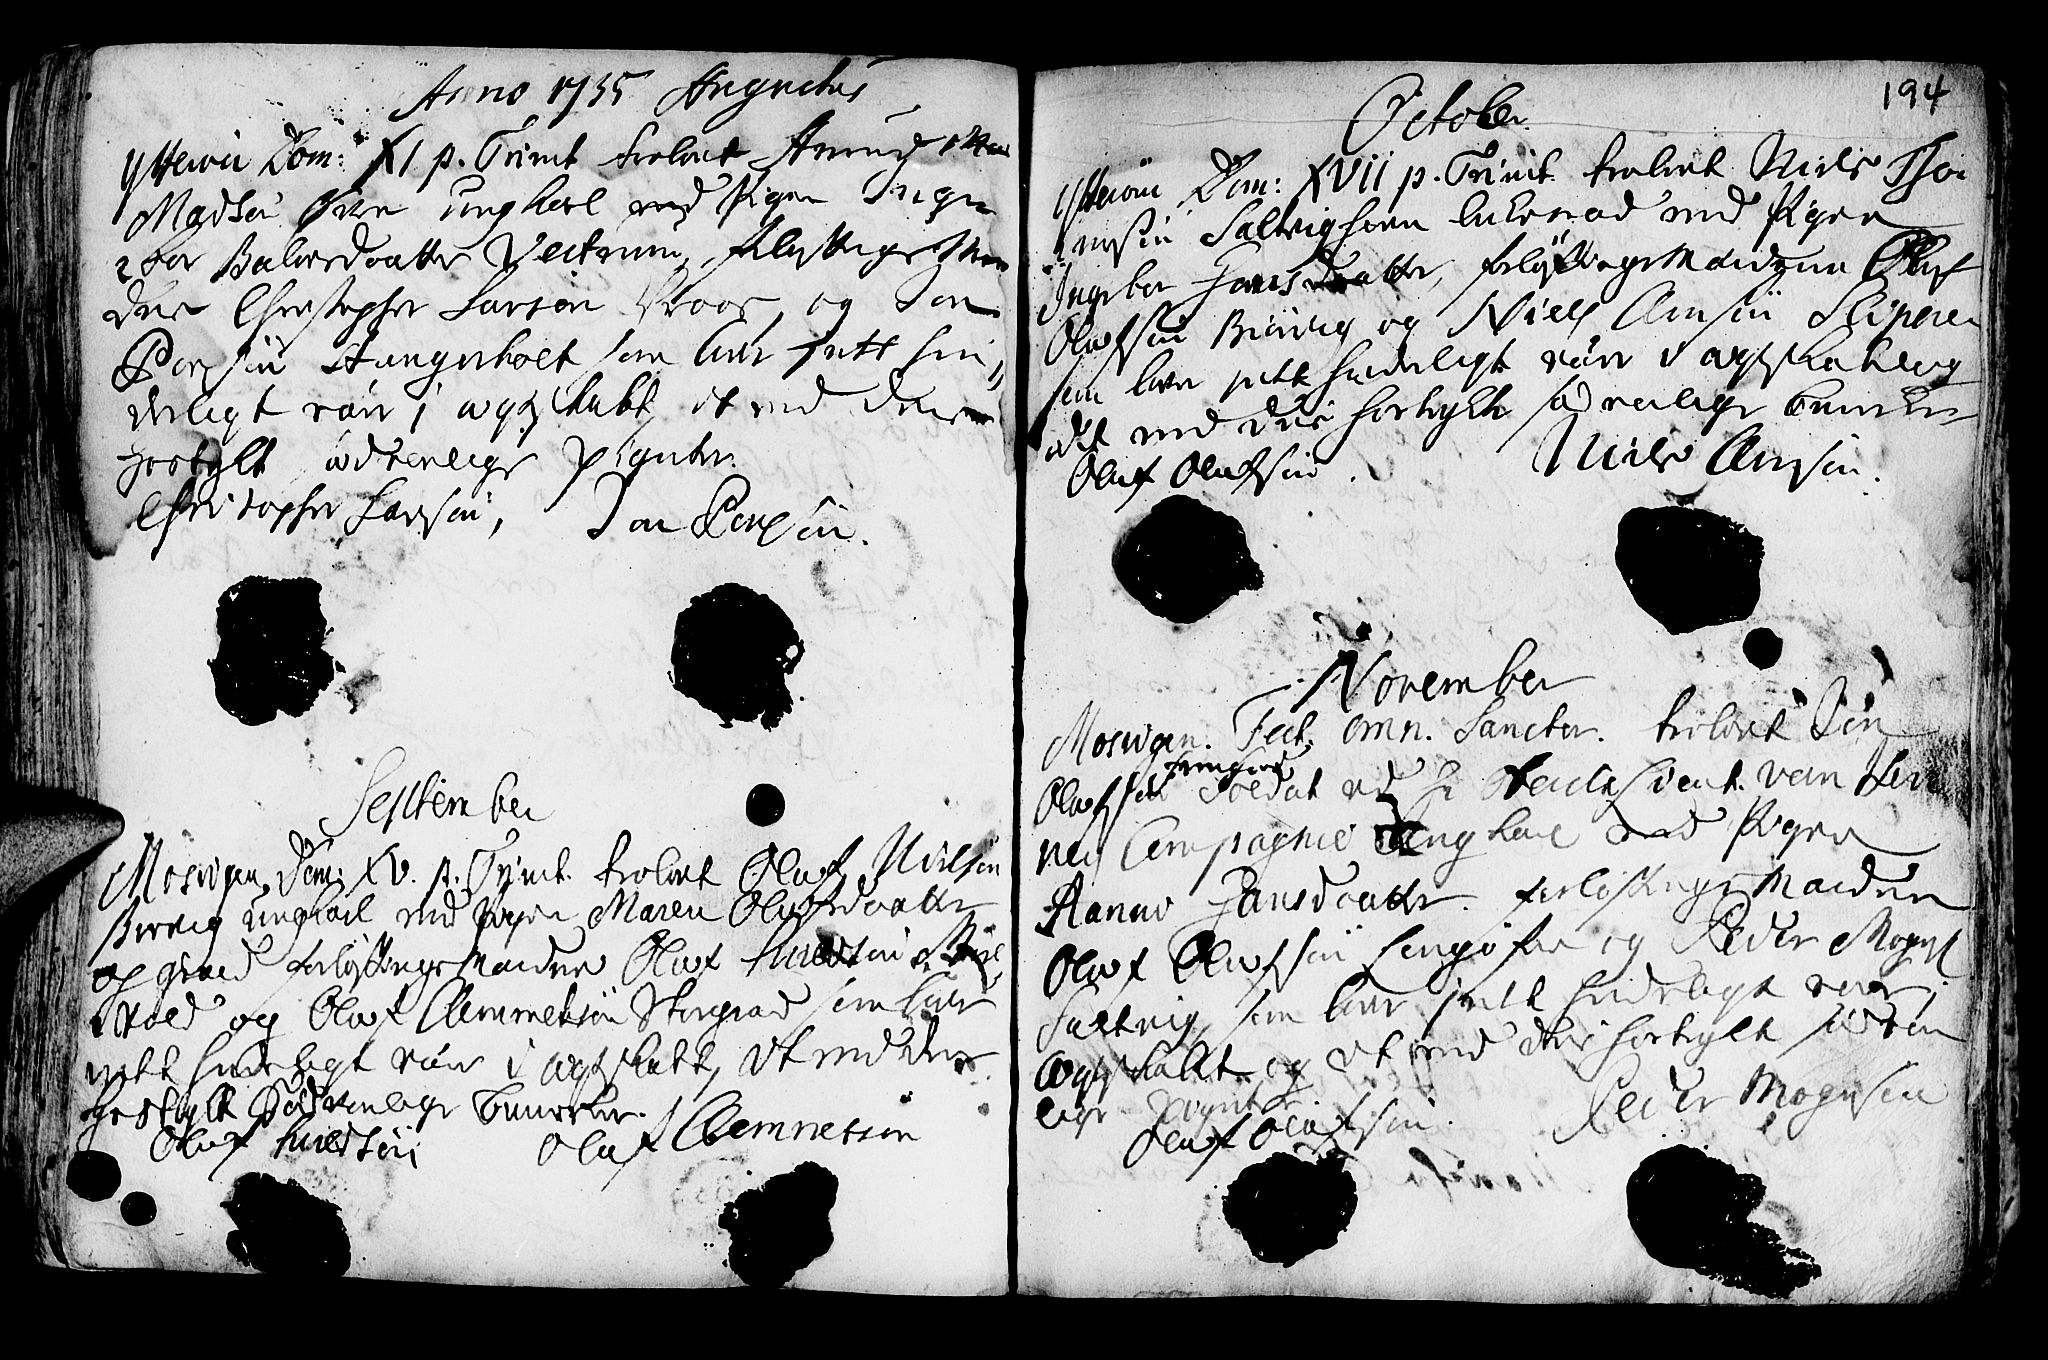 SAT, Ministerialprotokoller, klokkerbøker og fødselsregistre - Nord-Trøndelag, 722/L0215: Ministerialbok nr. 722A02, 1718-1755, s. 194a